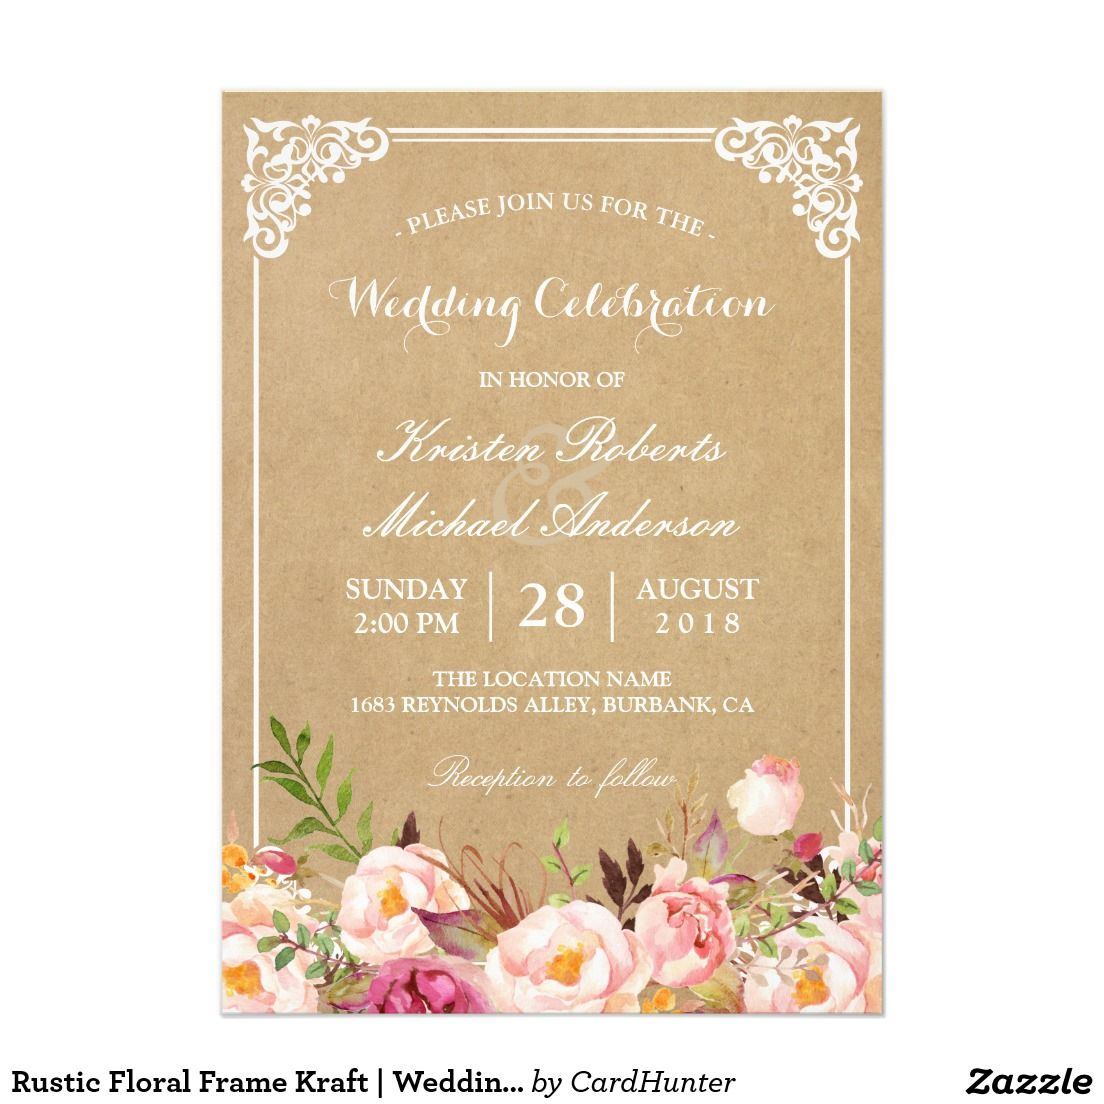 Rustic Fl Frame Kraft Wedding Celebration Card